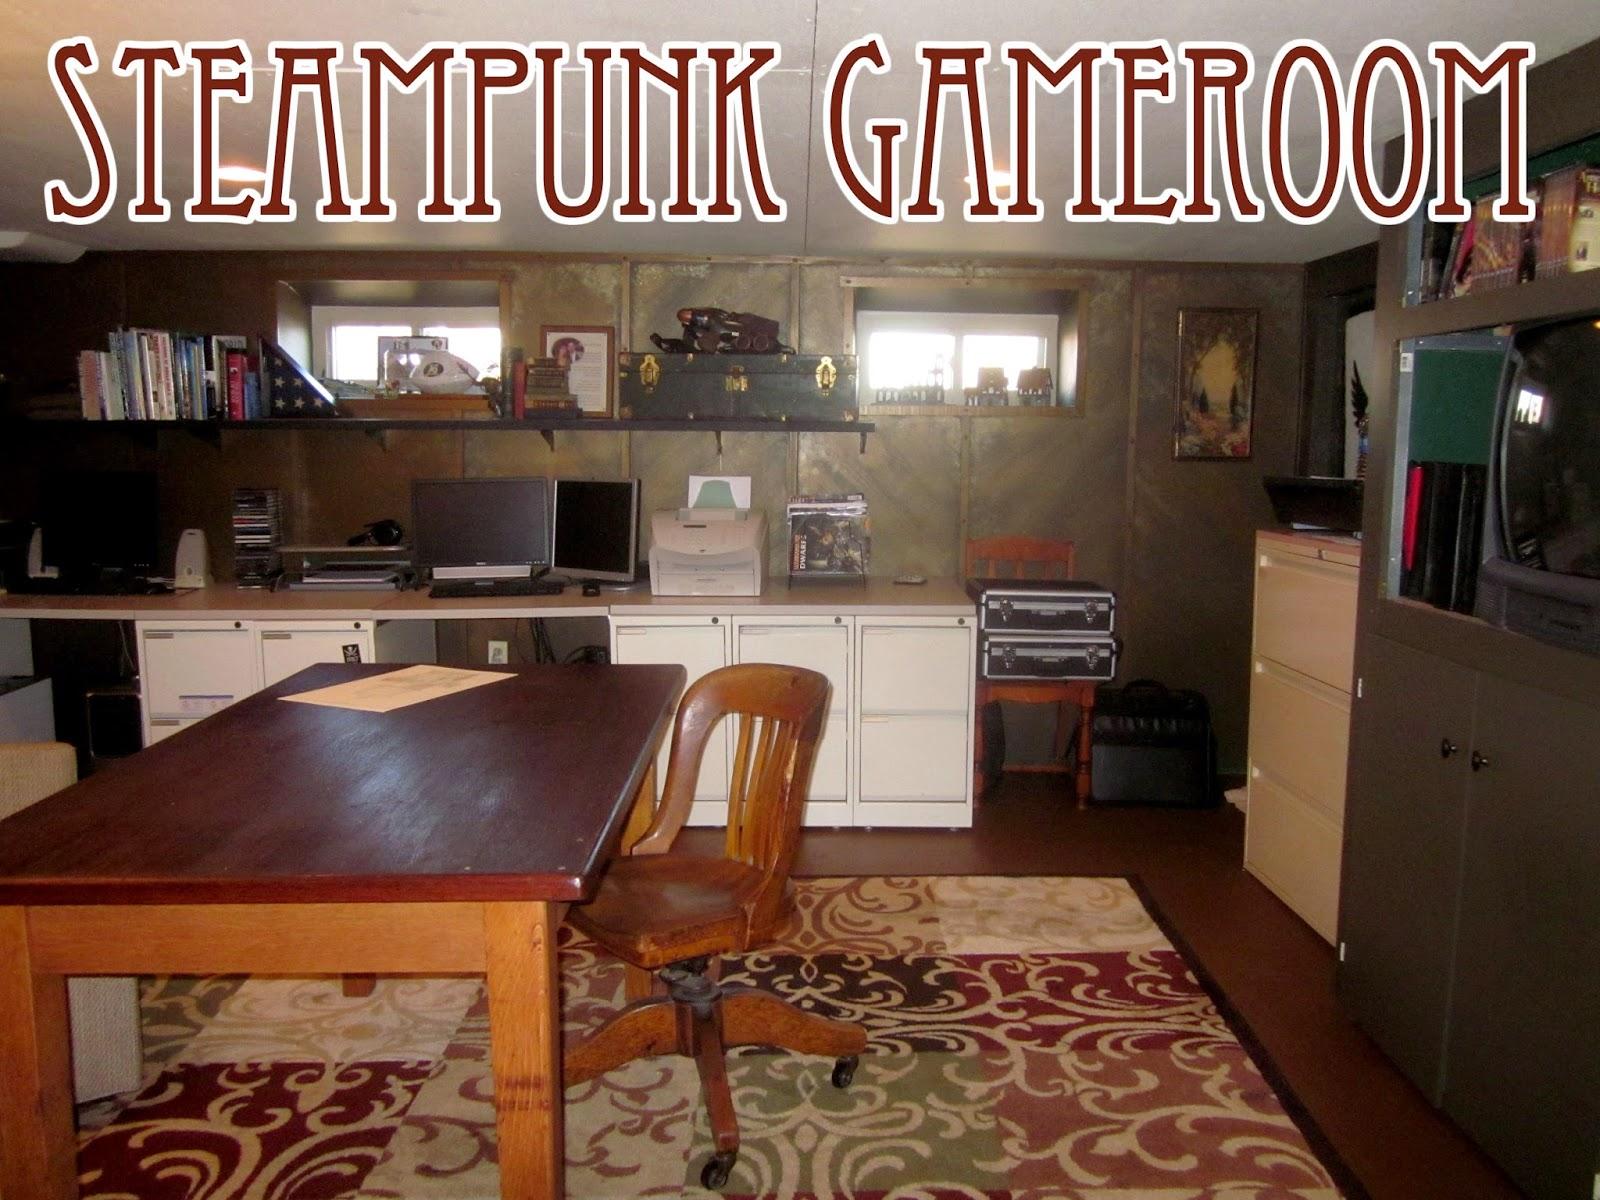 Steampunk Gameroom